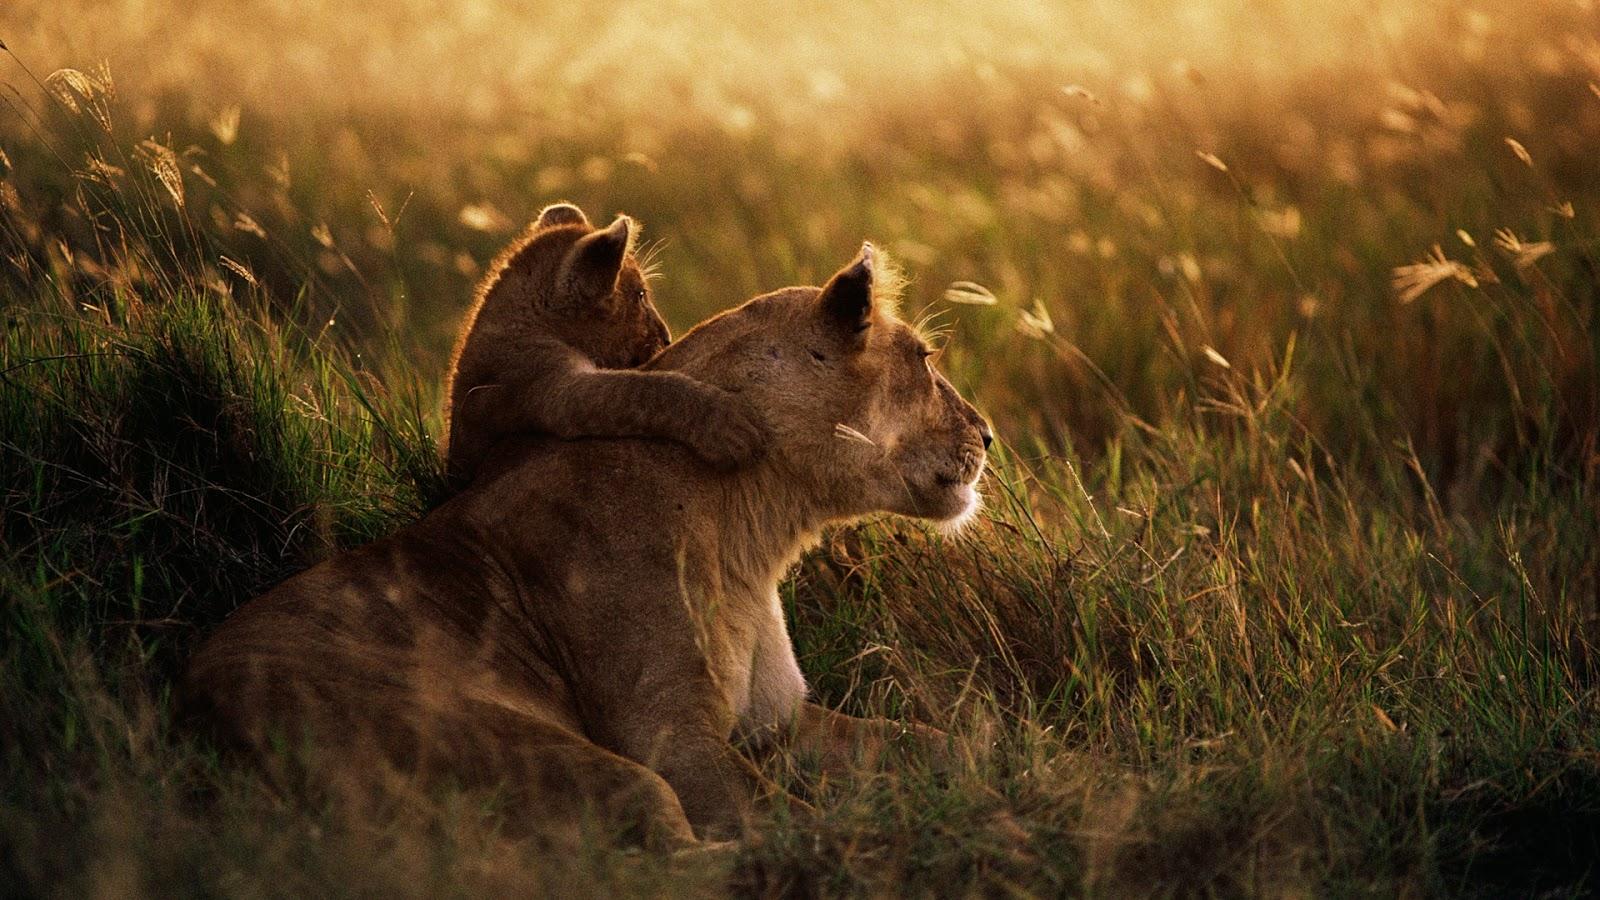 African Lion Full HD Desktop Wallpapers 1080p 1600x900